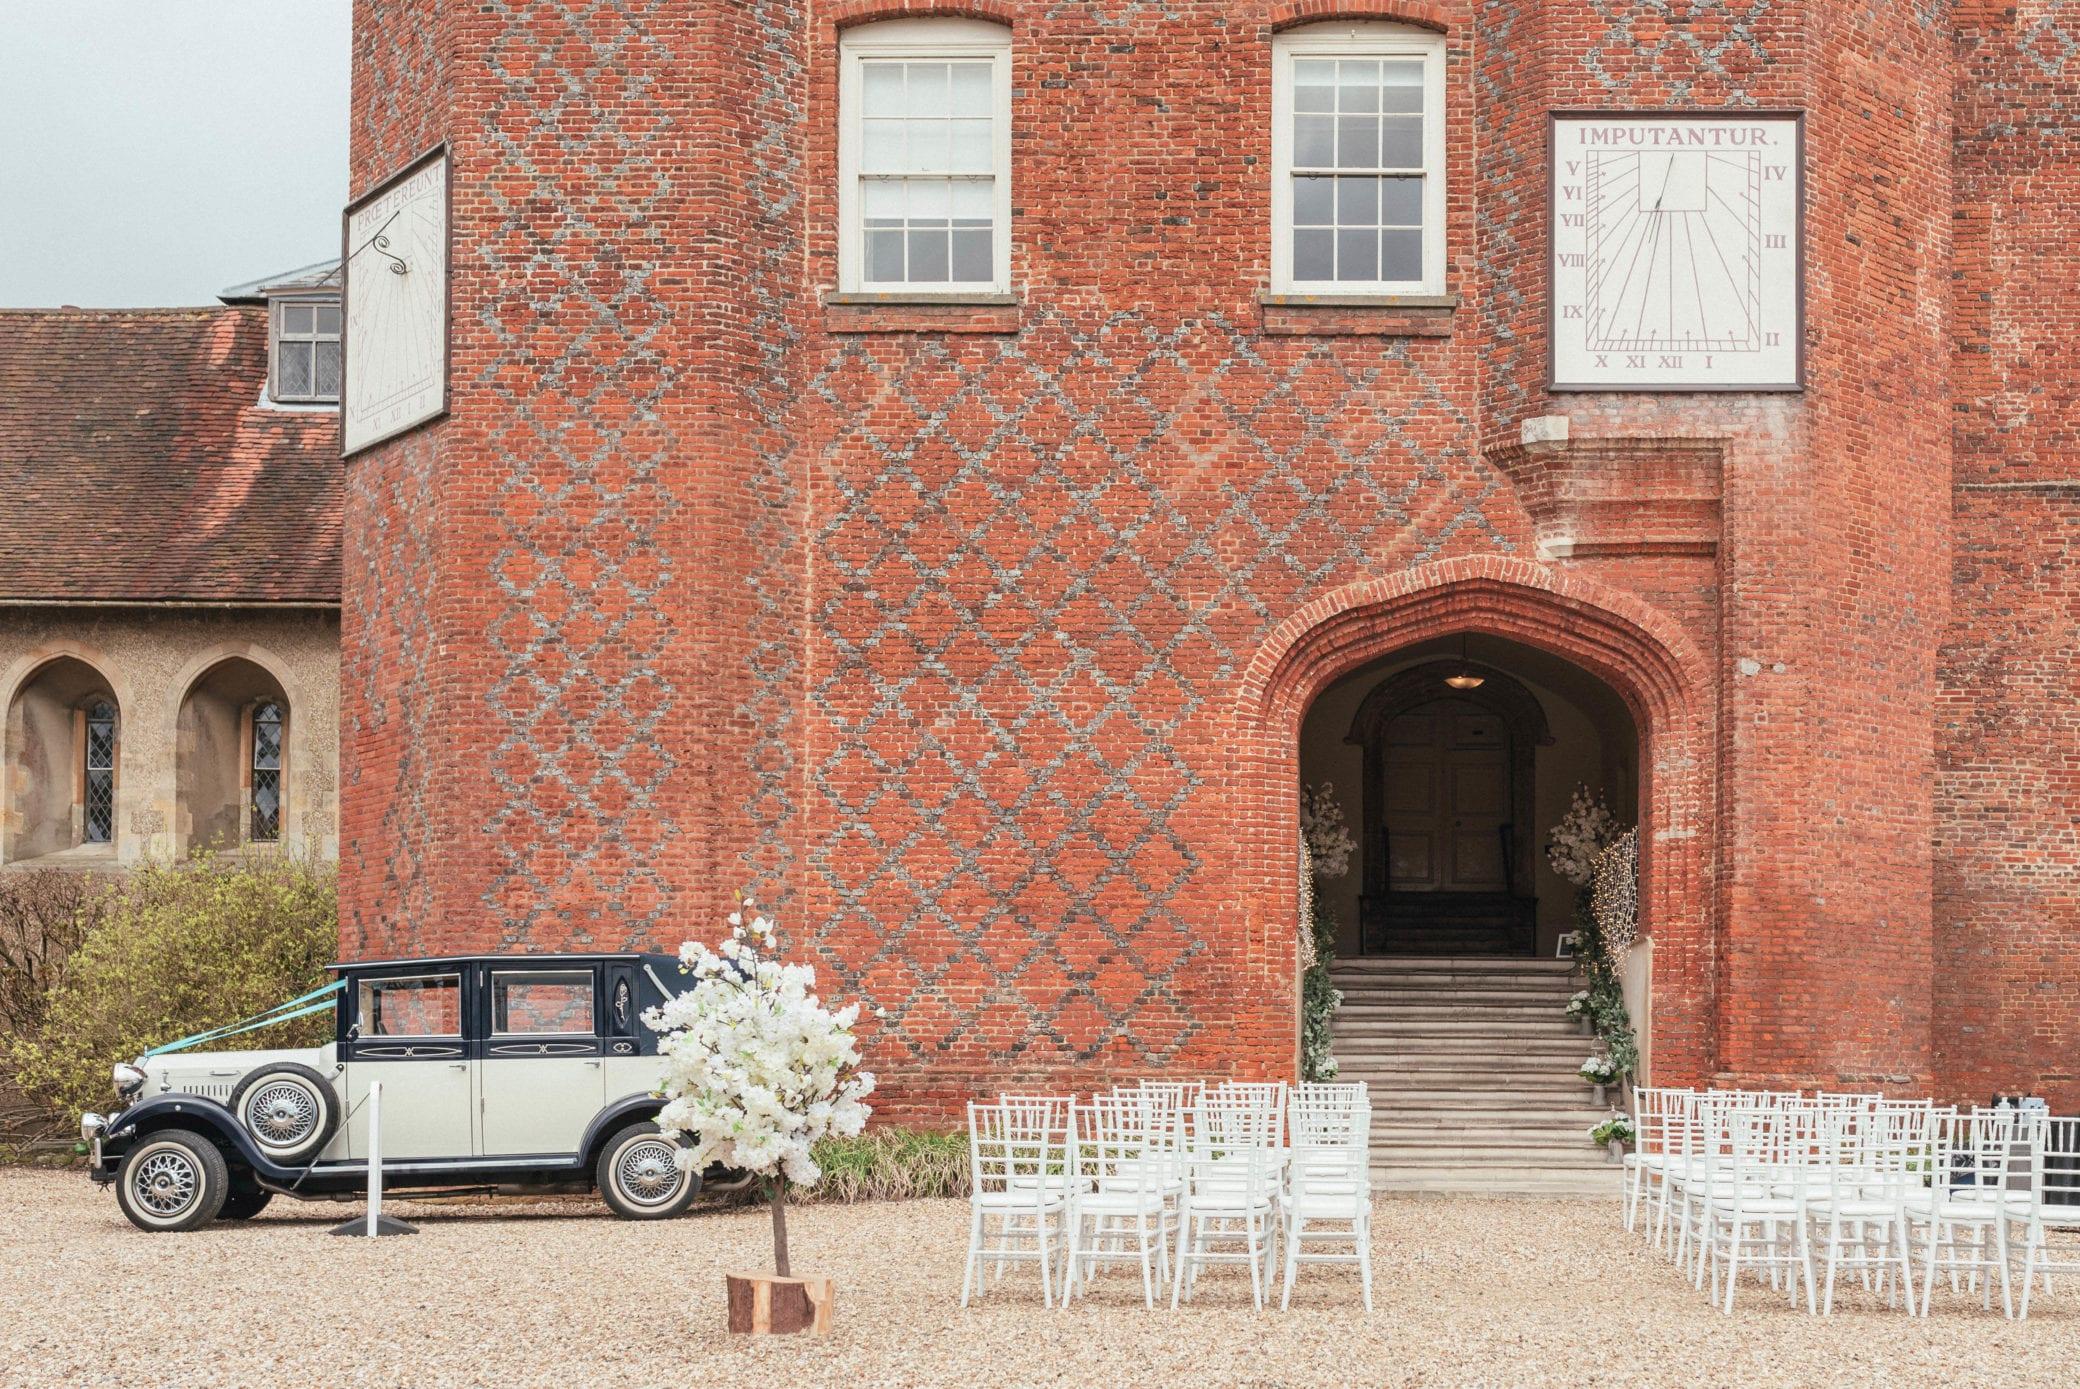 Outdoor wedding ceremonies at Farnham Castle in Surrey